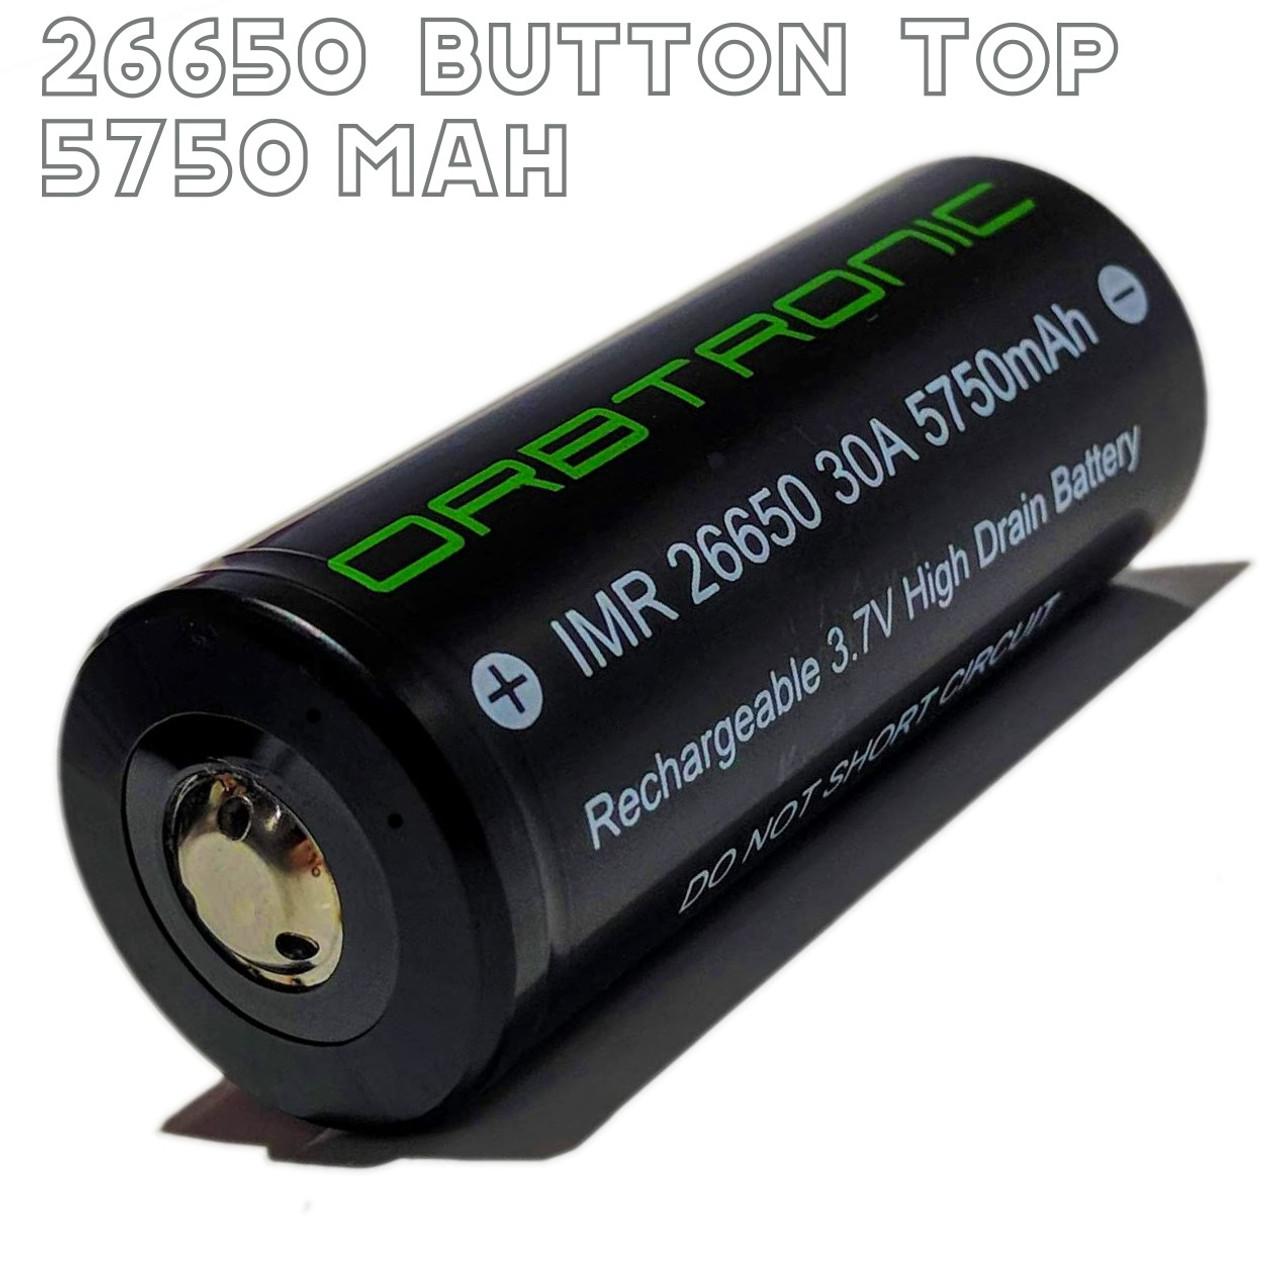 26650 Battery 30A Button Top 5750mAh High Capacity-High Drain 3 7V IMR  Li-ion